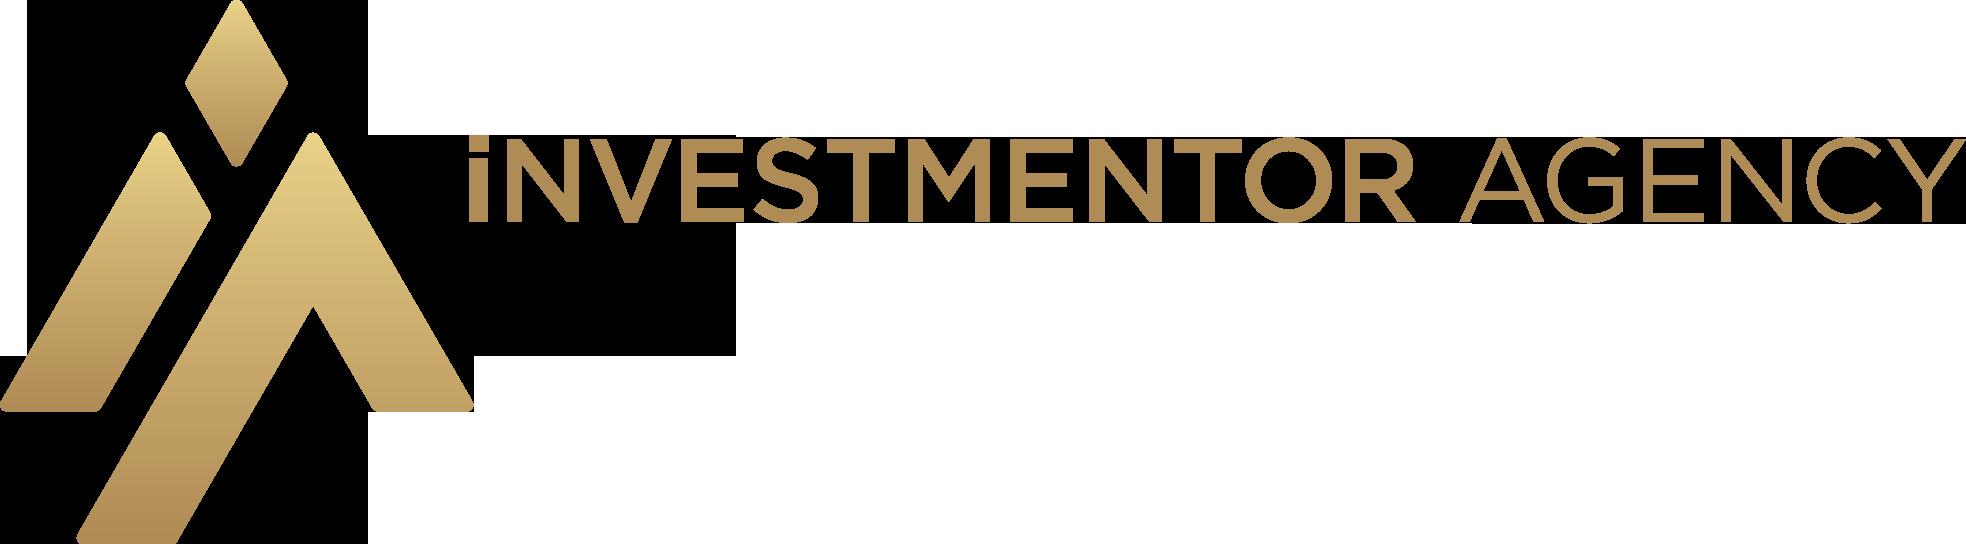 Investmentor Agency